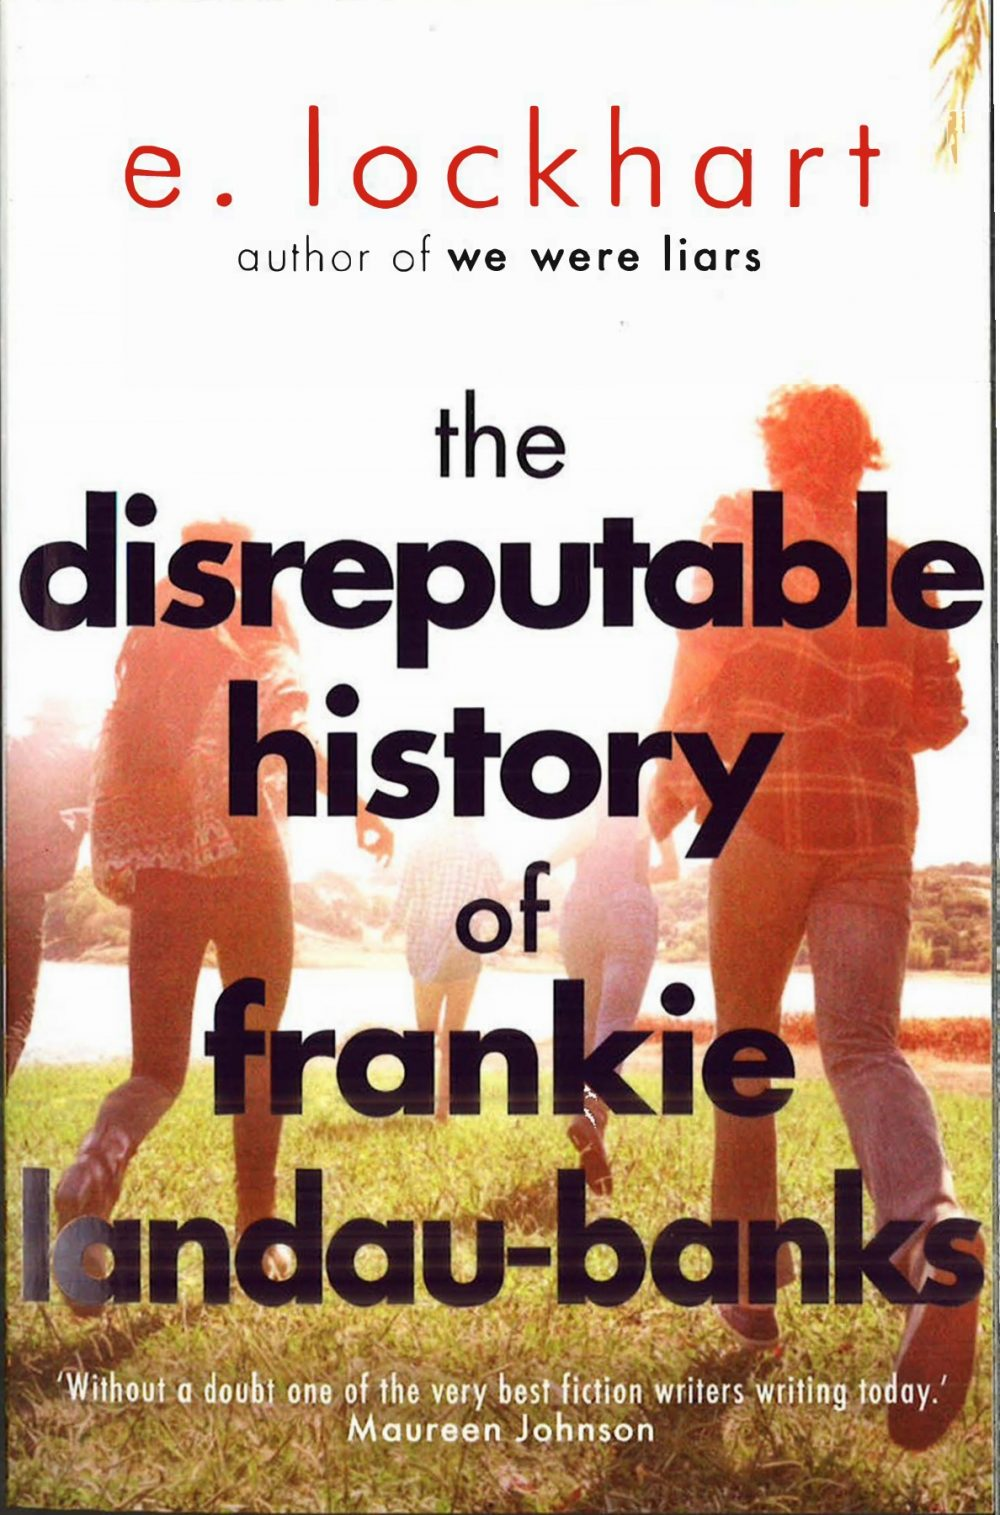 The Disreputable History of Frankie Landau Banks